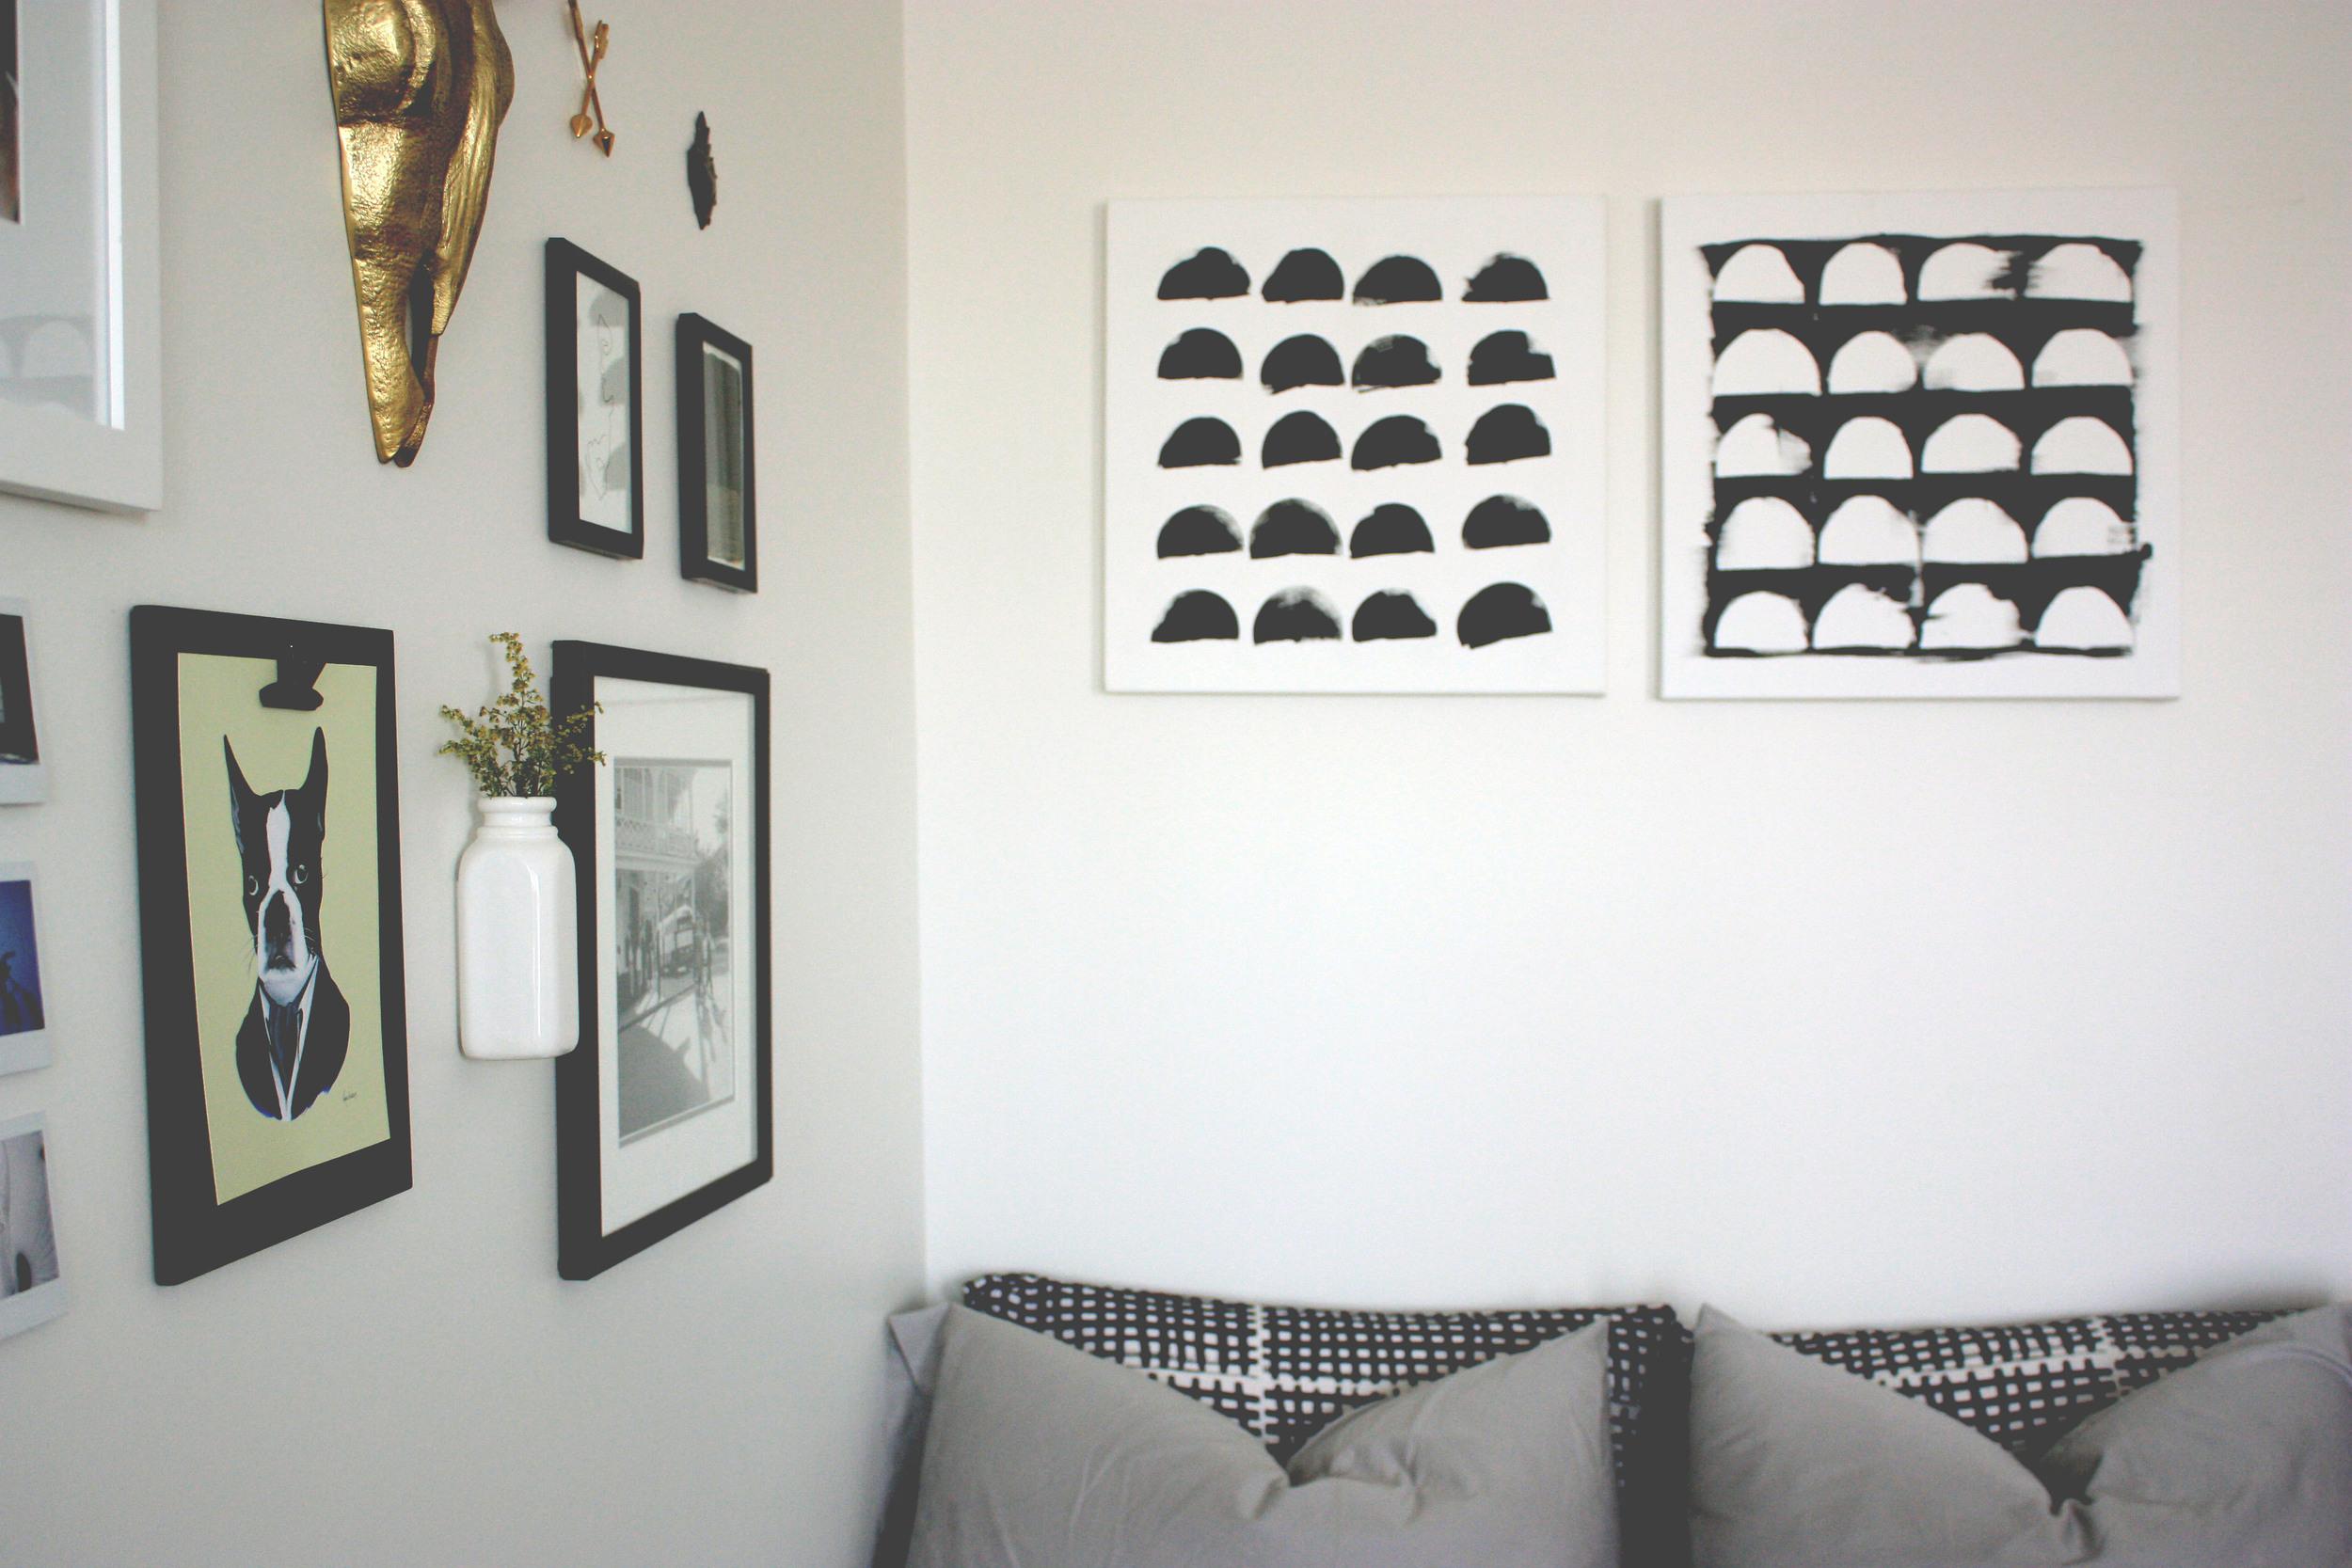 diy-gallery-wall-art.jpg